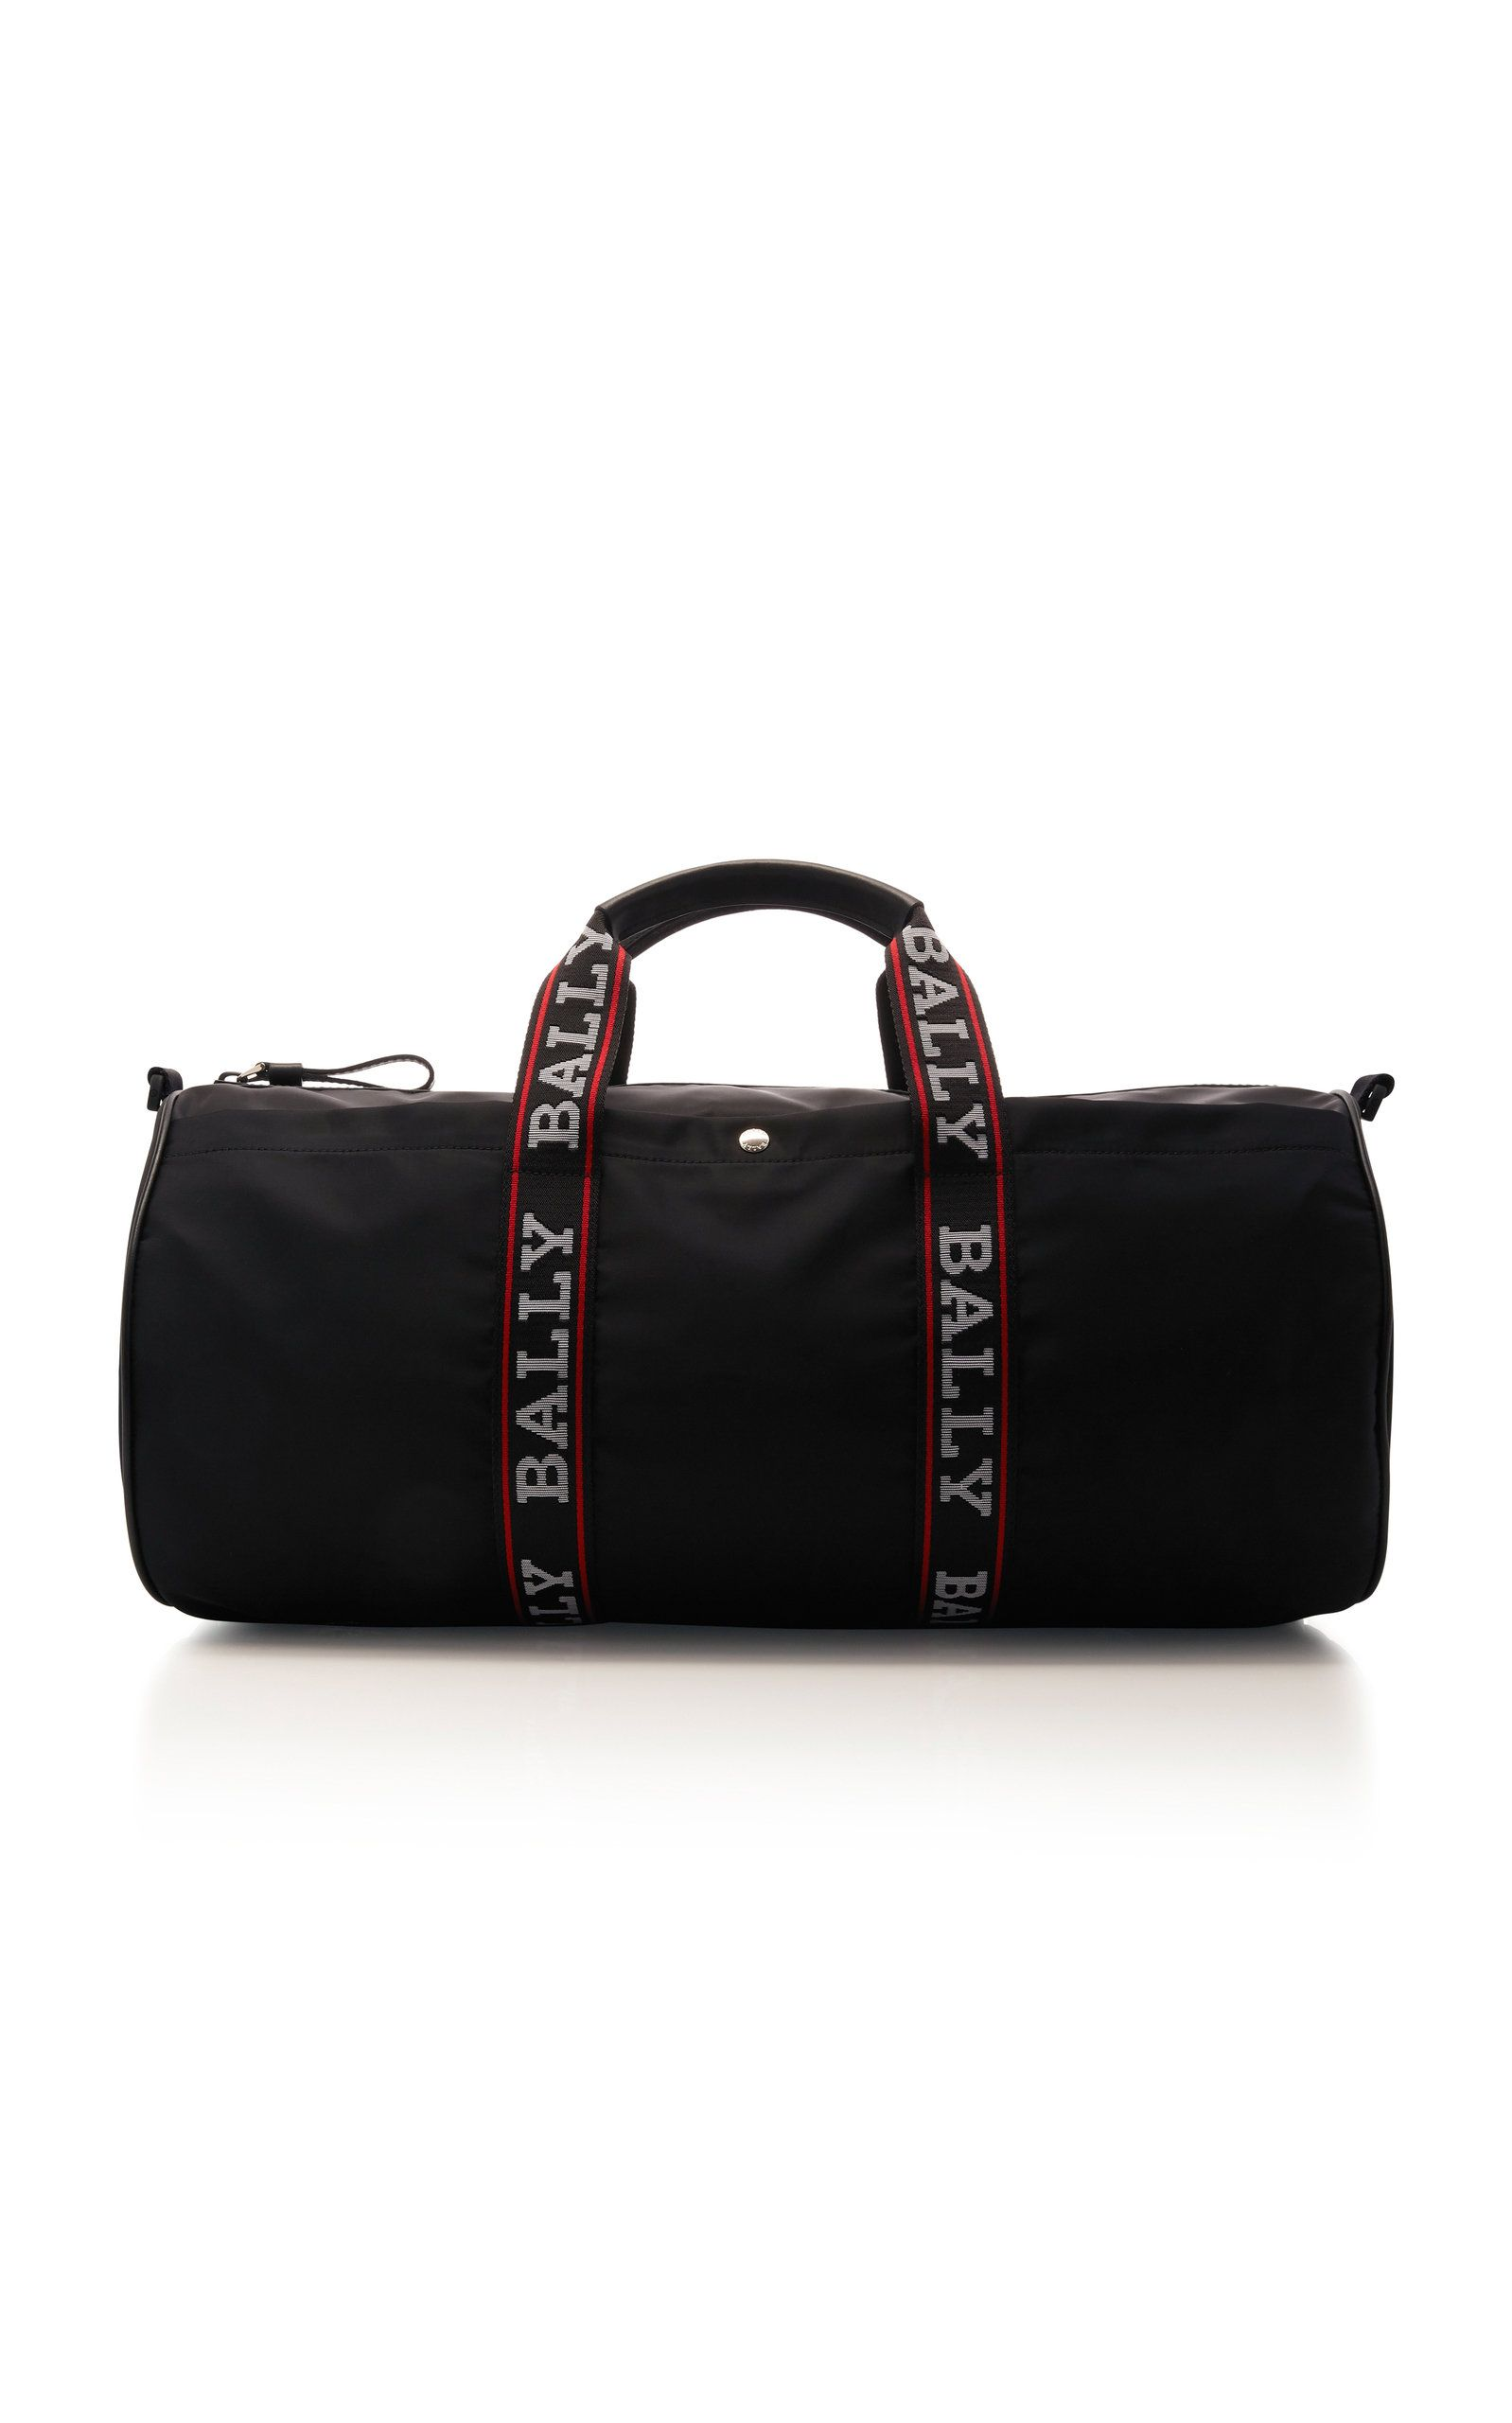 3f5dc3430ae BALLY NYLON LOGO DUFFLE BAG.  bally  bags  travel bags  nylon  weekend